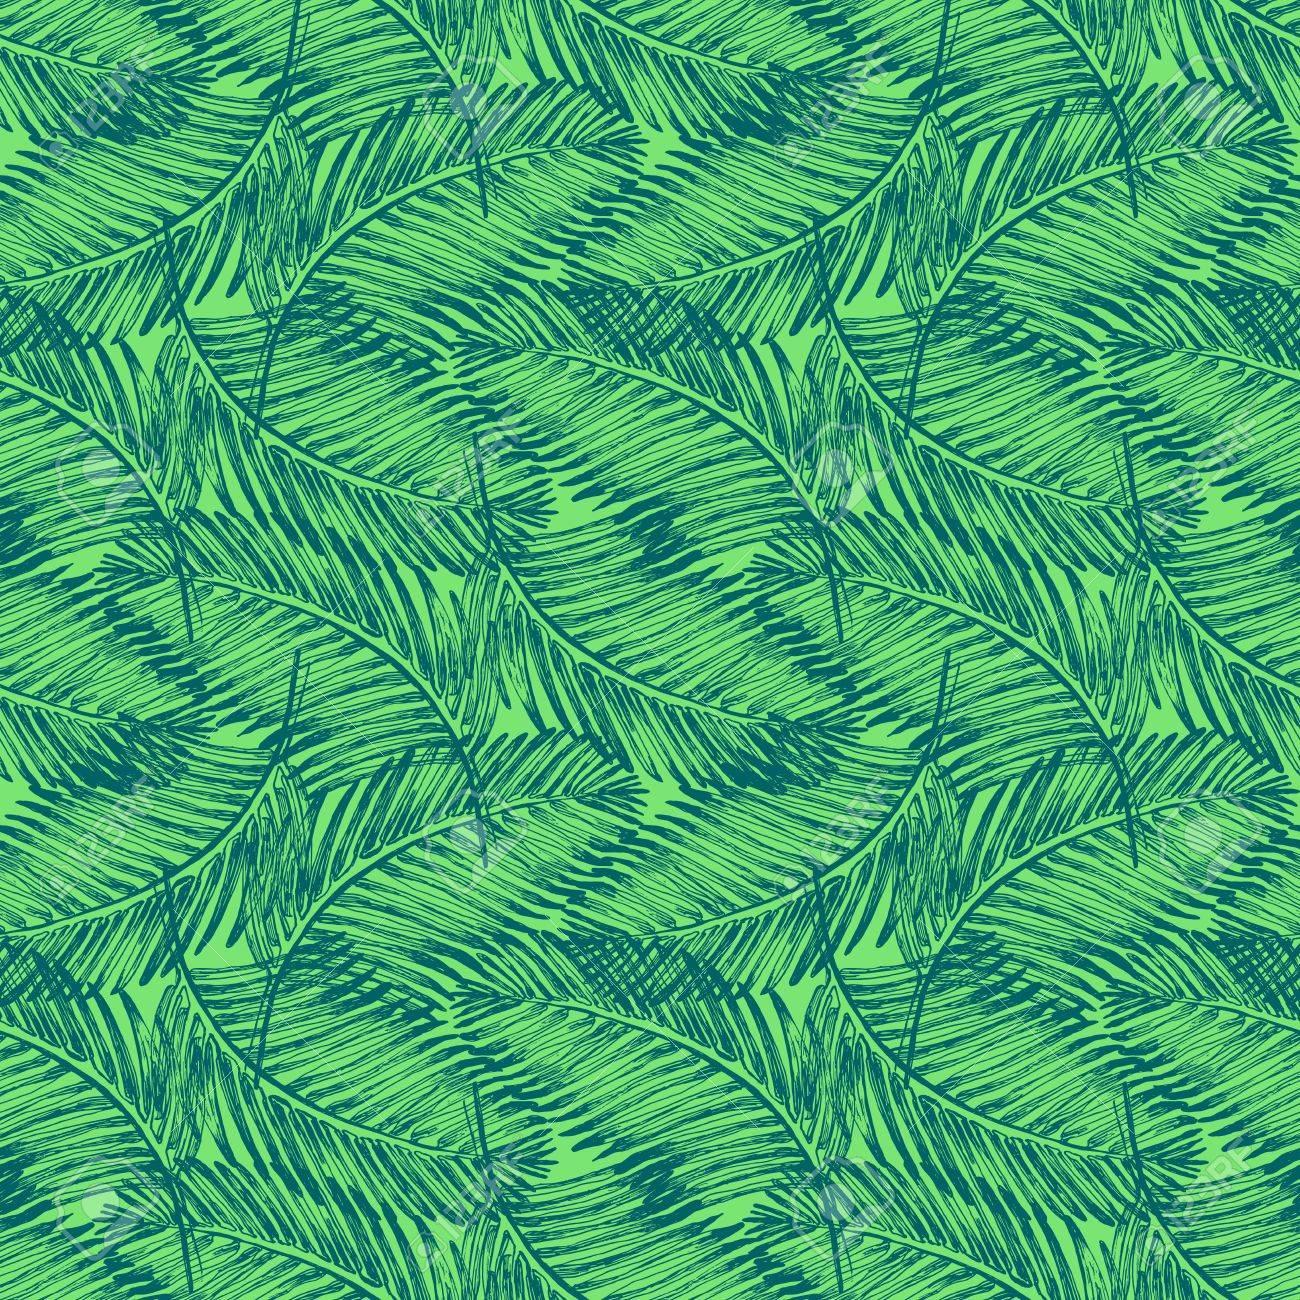 Palm Leaves Illustration Tropical Jungle Plant Vector Wallpaper Seamless Textile Pattern Retro Vintage